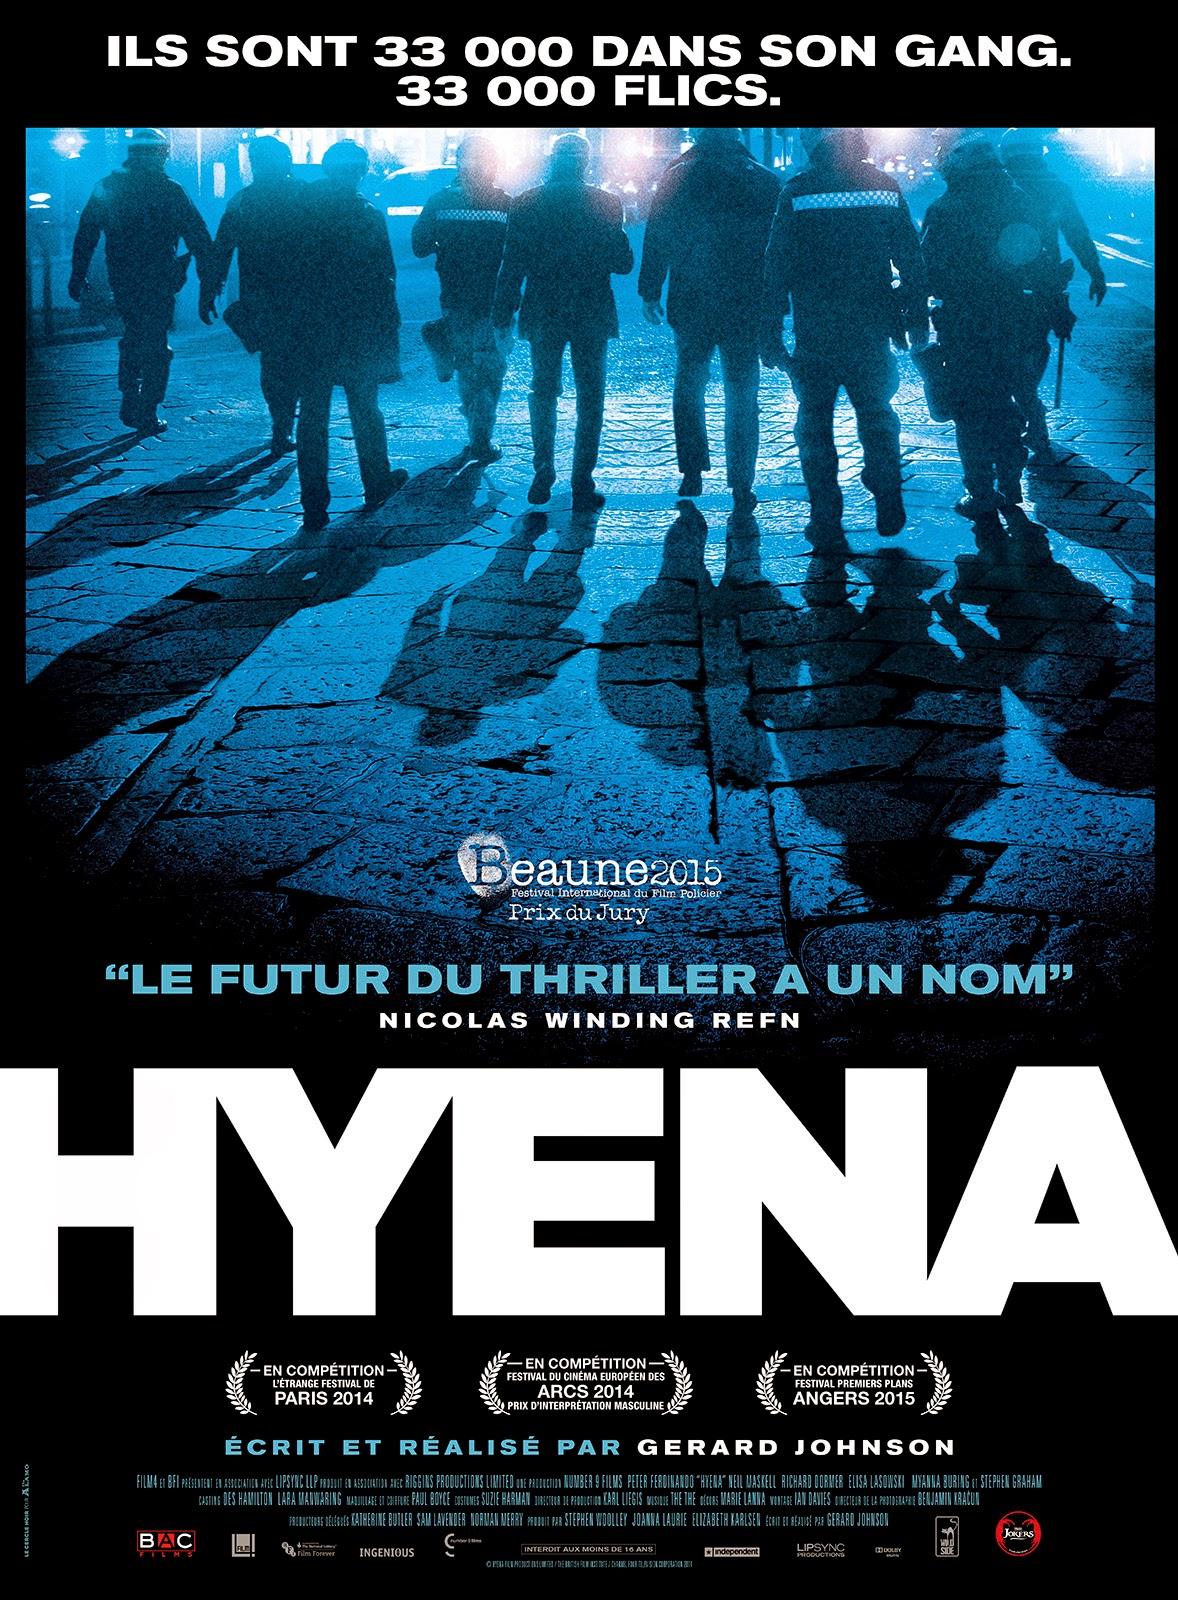 http://fuckingcinephiles.blogspot.fr/2015/05/critique-hyena.html